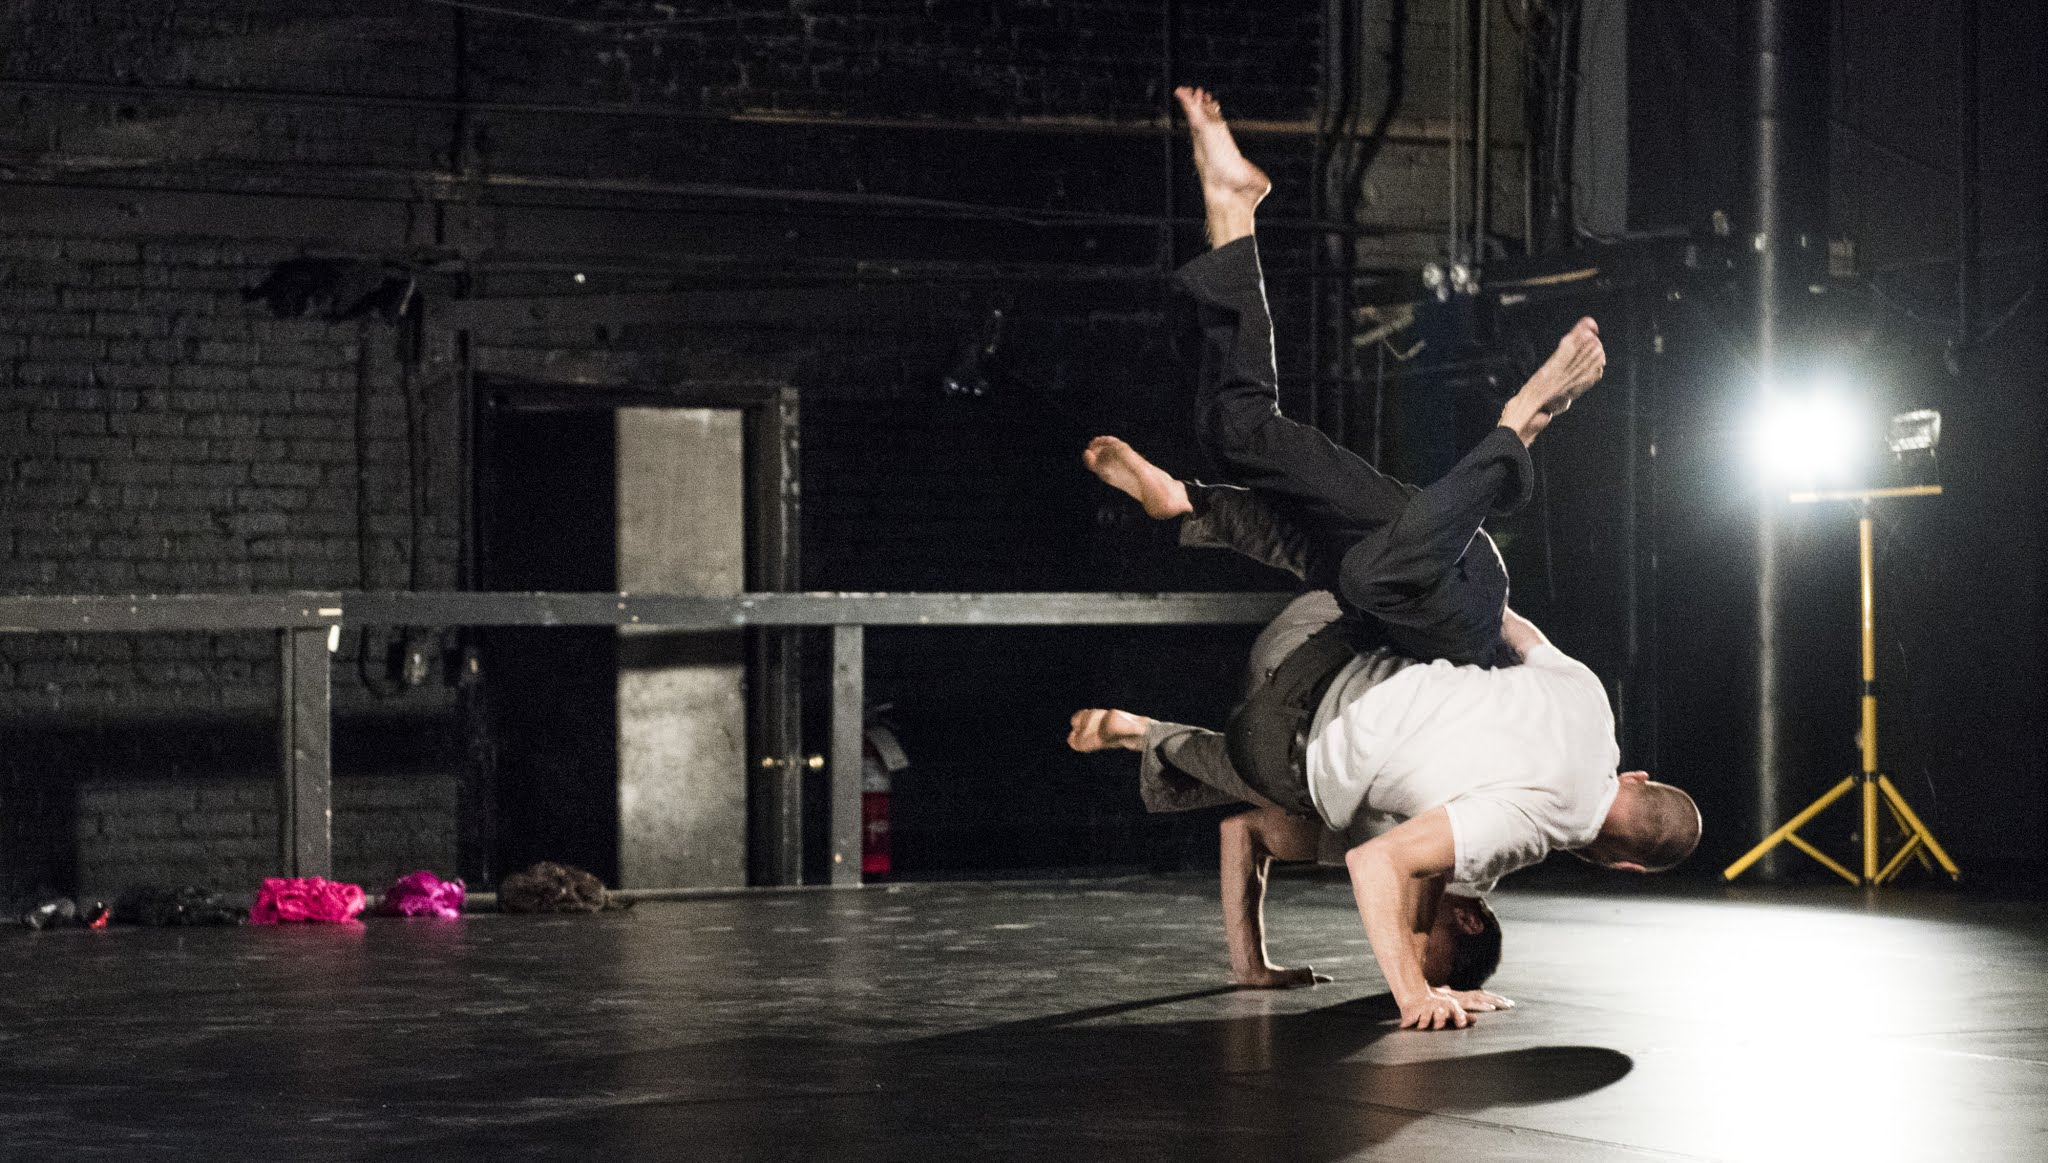 """Work in Progress""  Jessie Garon - VAZARI DANCE PROJECTS  Photo by Omer Yukseker"